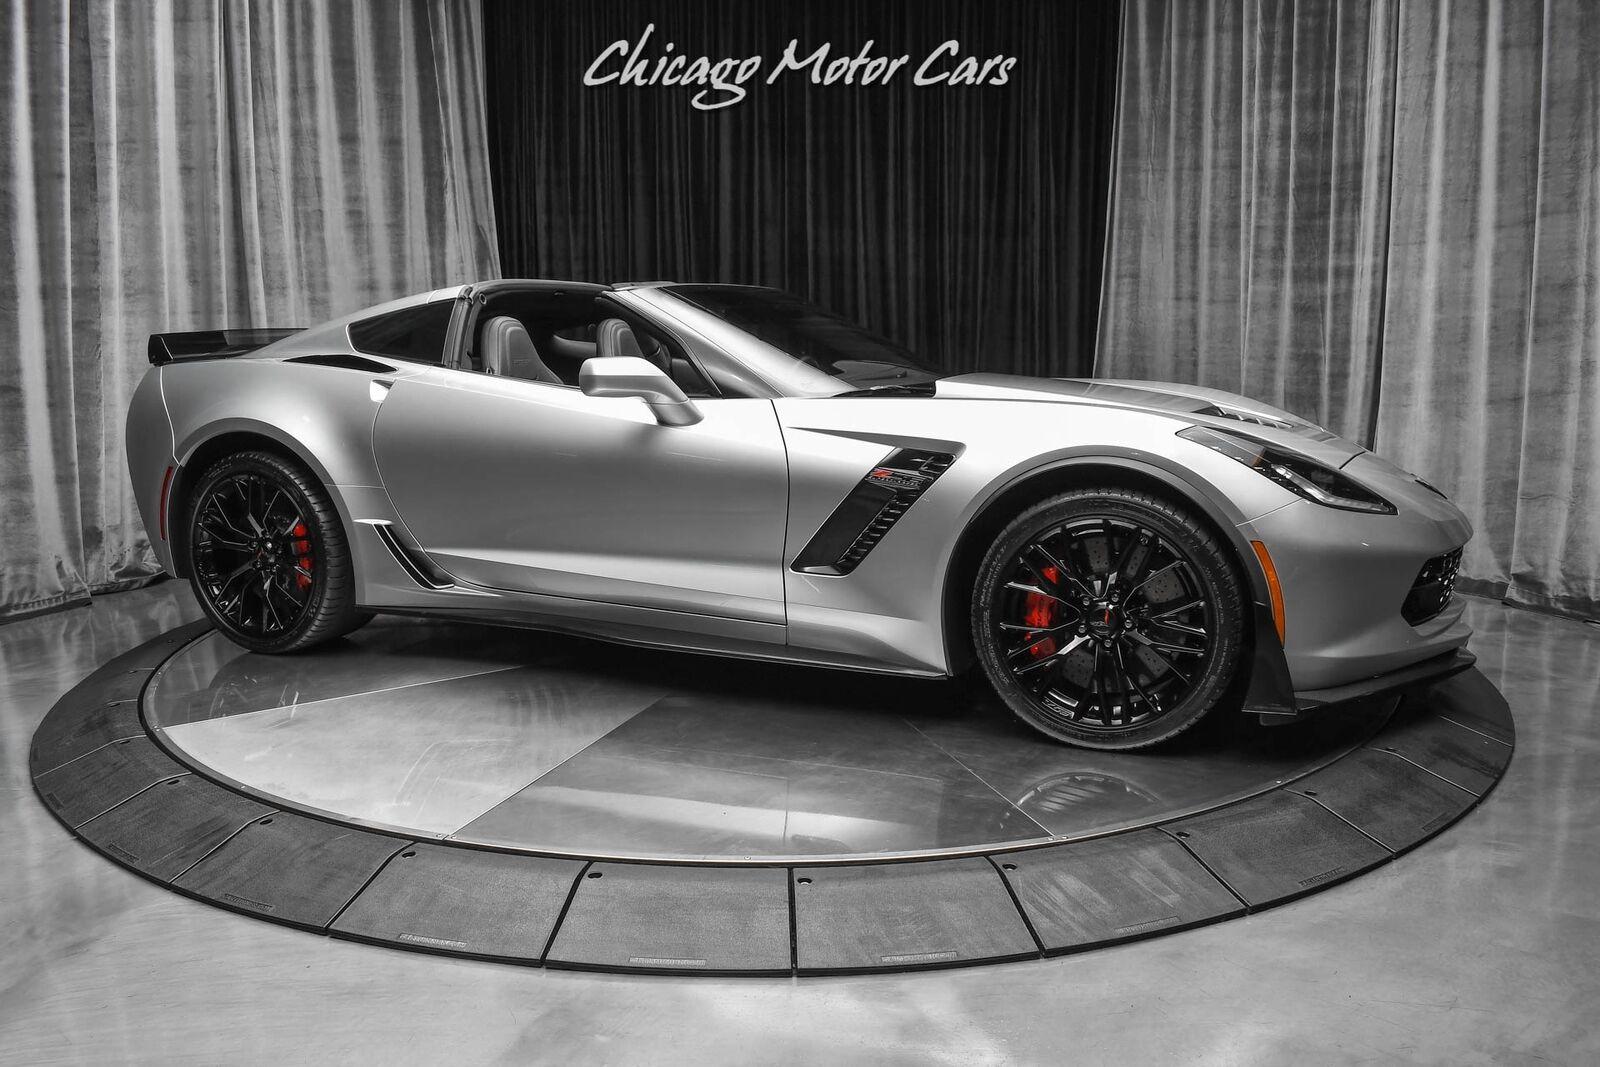 2016 Silver Chevrolet Corvette Z06 3LZ   C7 Corvette Photo 6